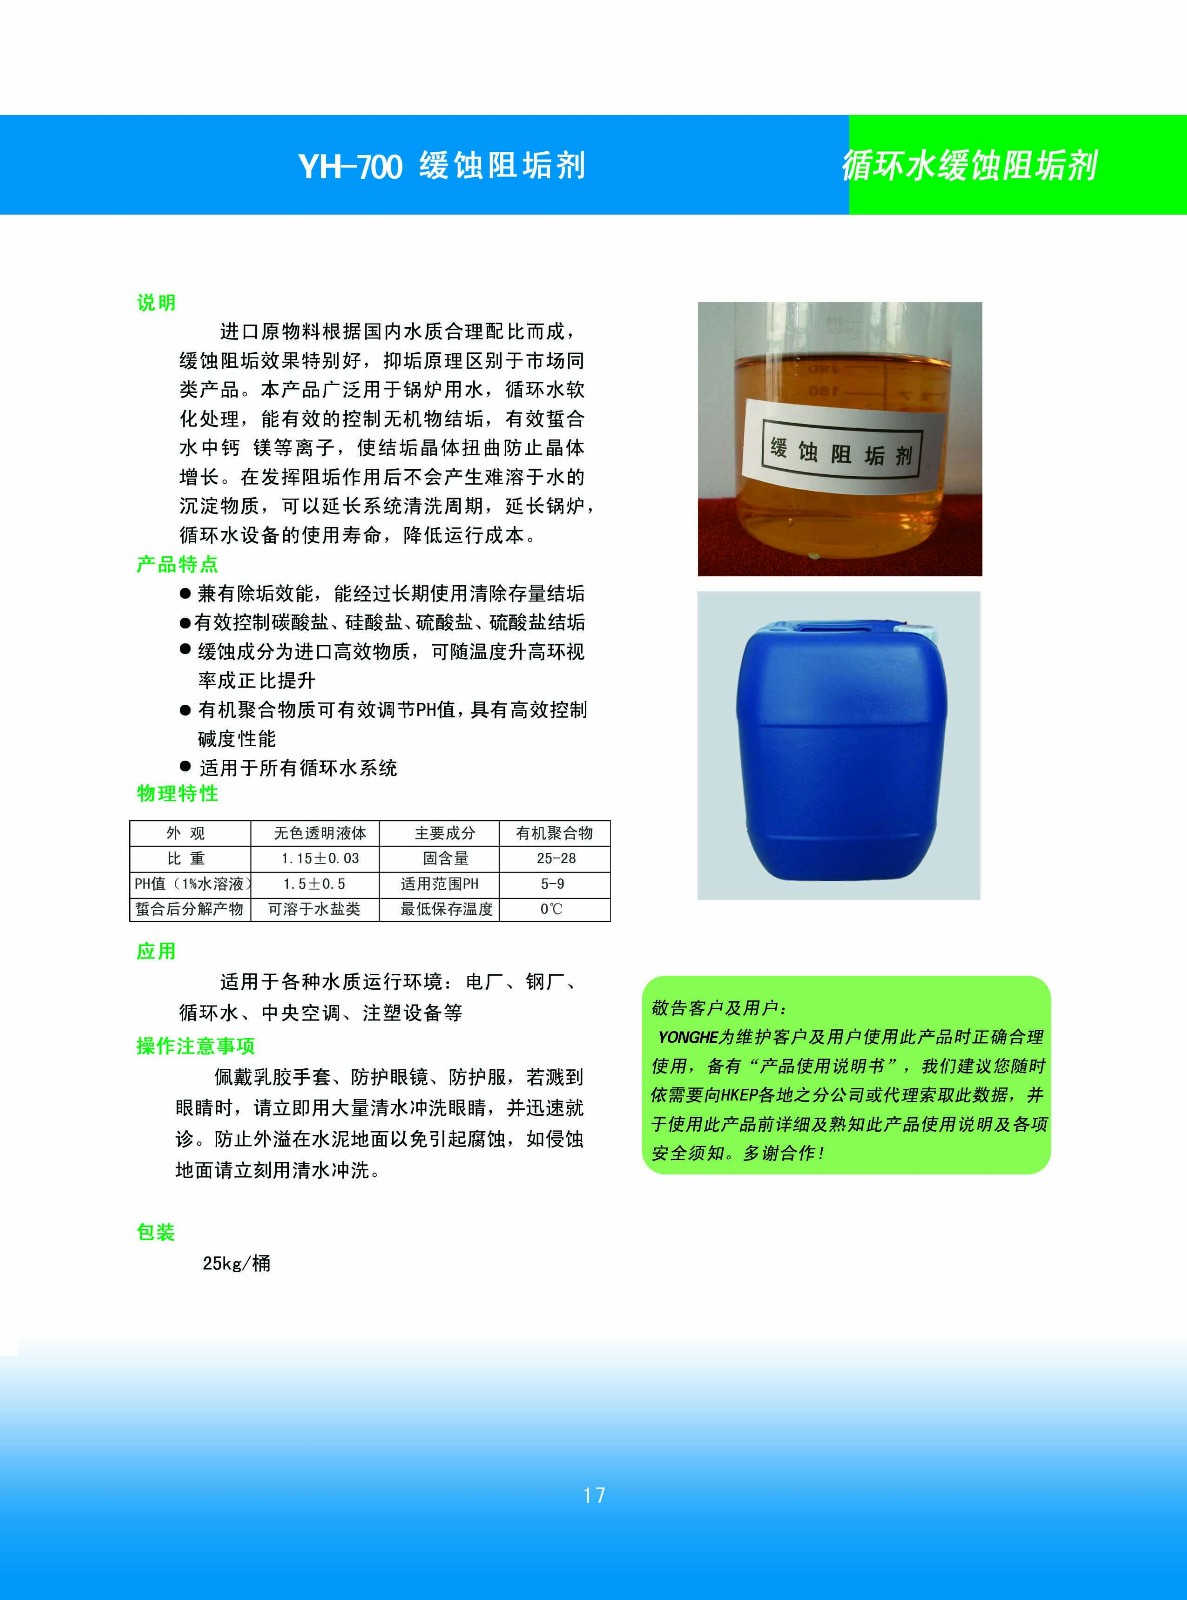 17 YH-700 缓蚀阻垢剂.jpg